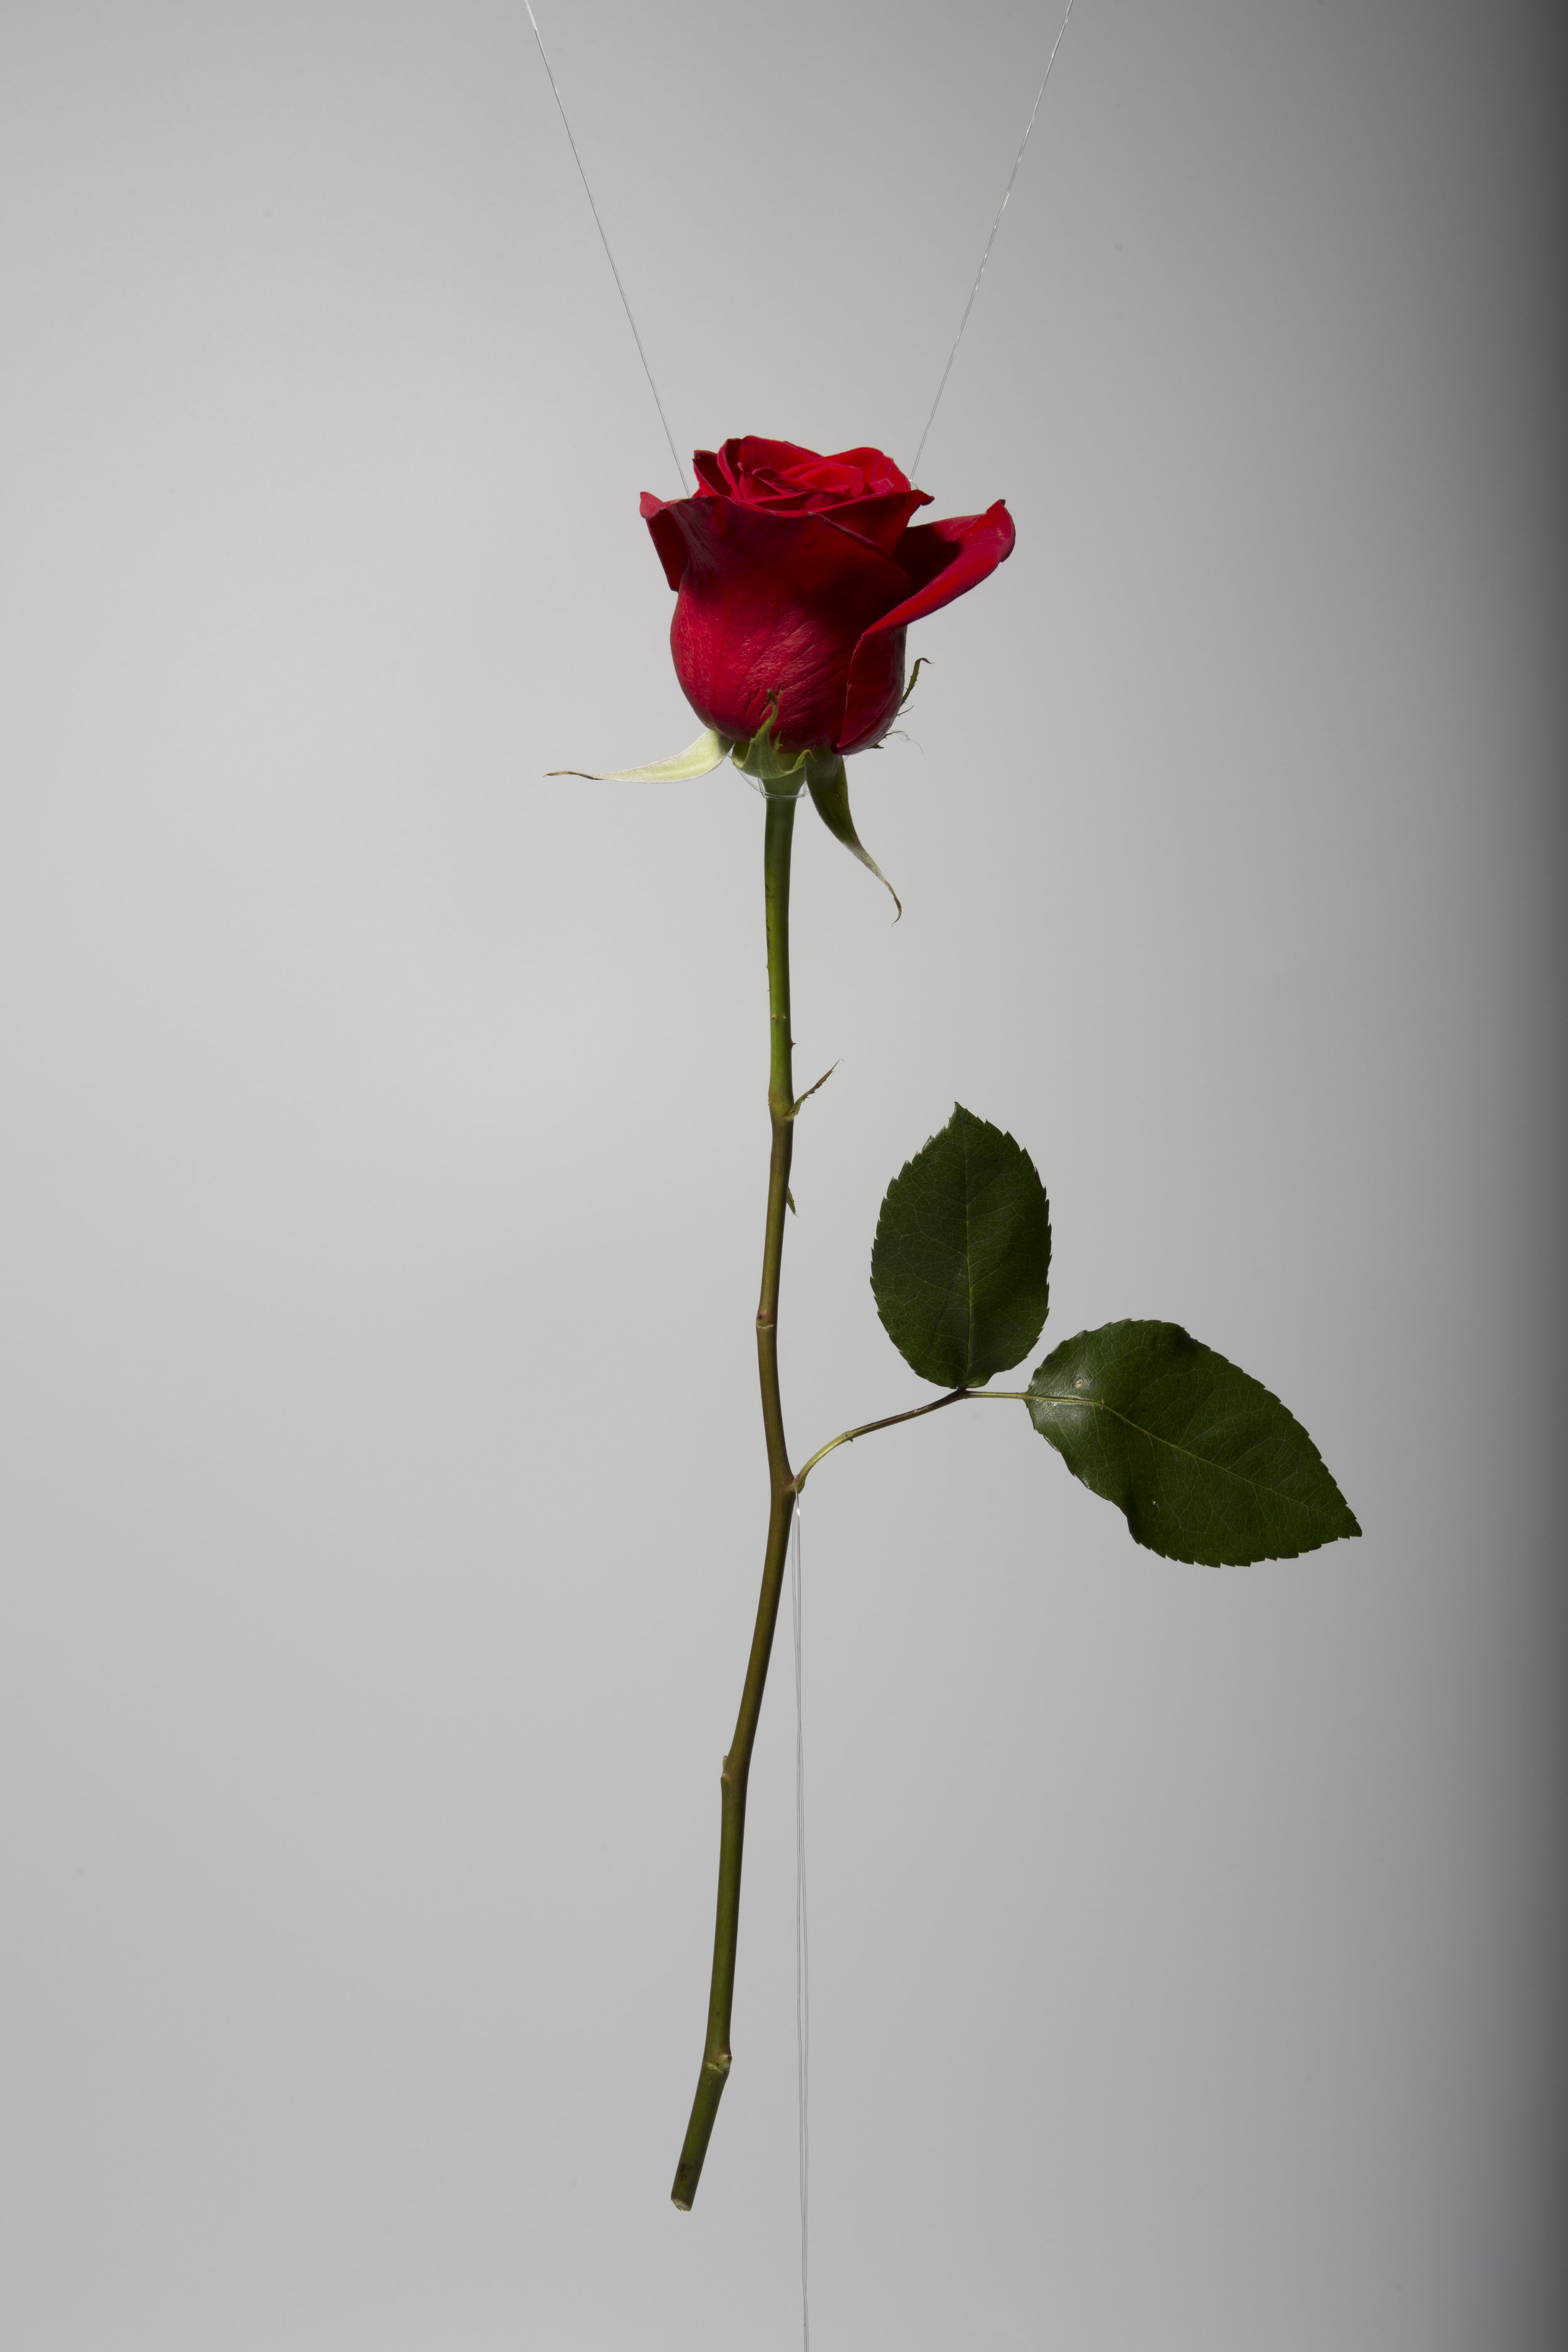 Red Rose I_unedited.jpg